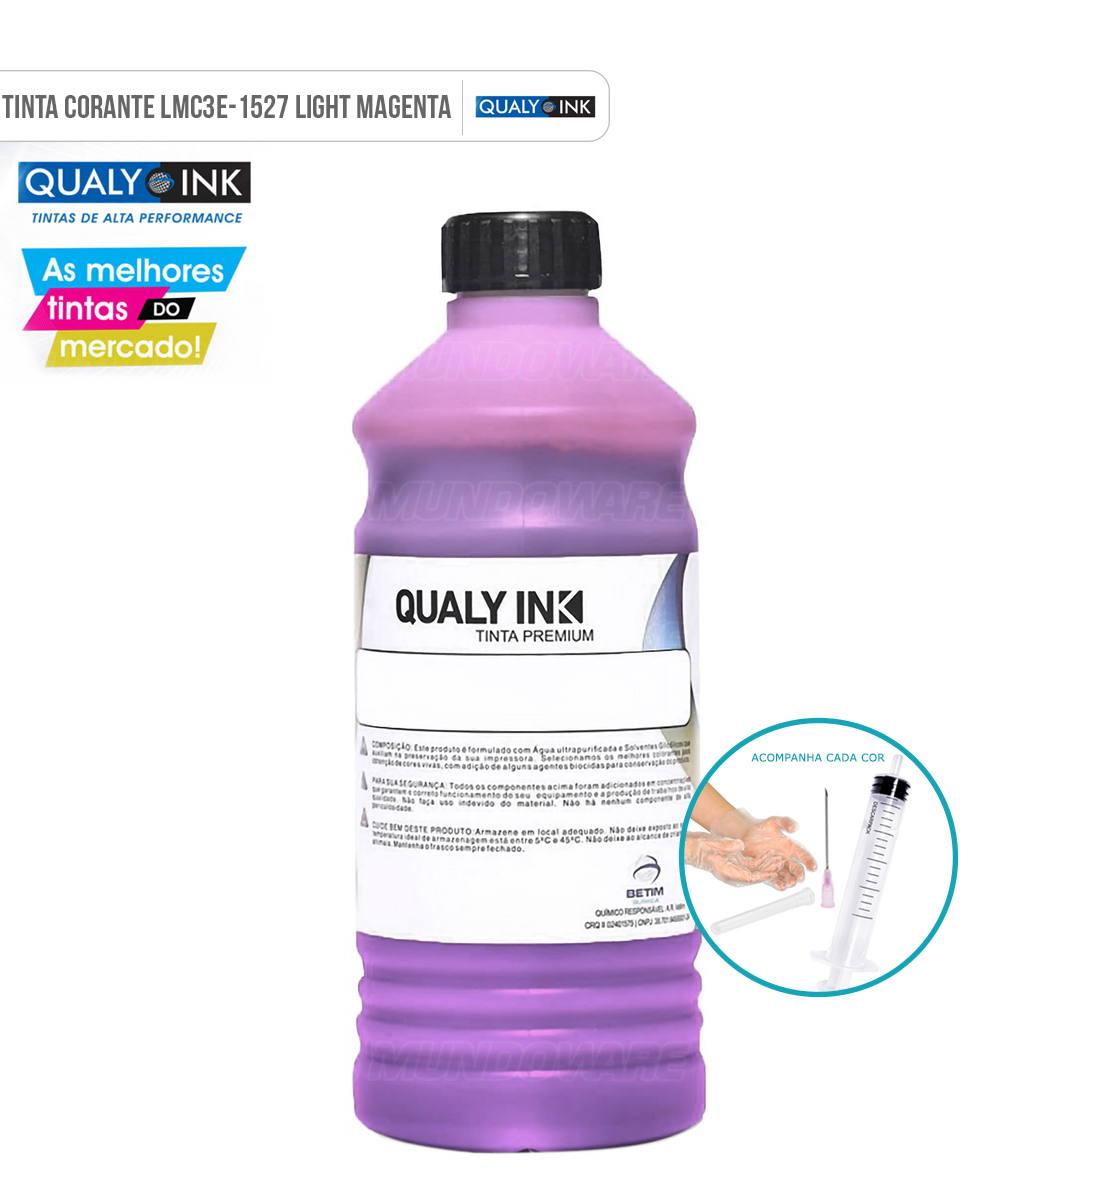 Refil de Tinta Qualy-Ink Magenta Light Corante para Epson série 673 impressoras L800 L805 L810 L850 L1800